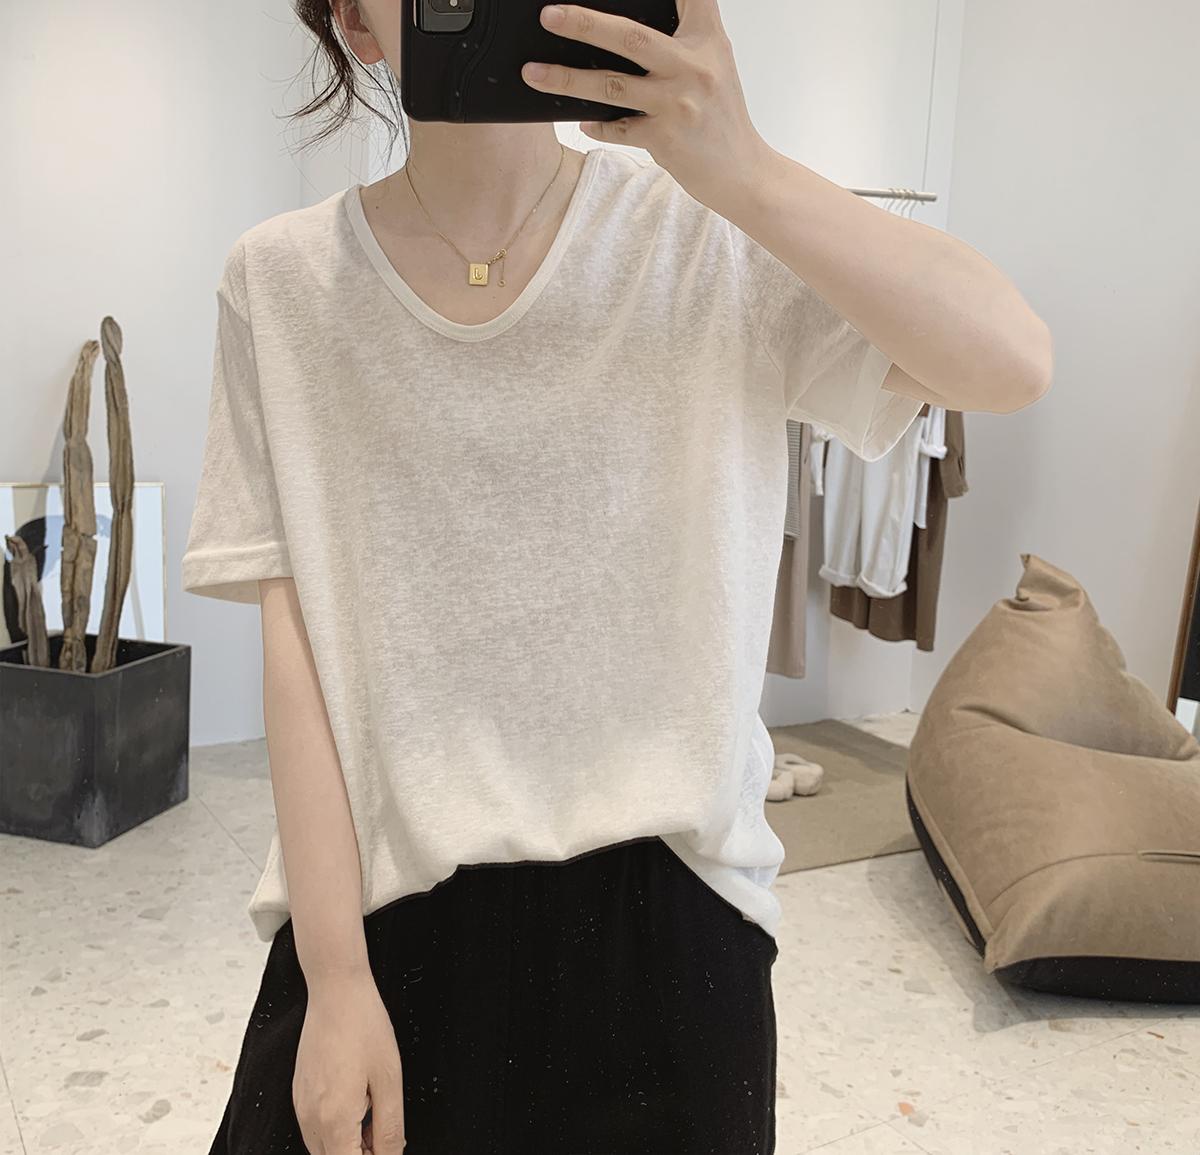 v领t恤女夏季新款宽松显瘦韩版简约打底衫减龄基础款短袖亚麻上衣